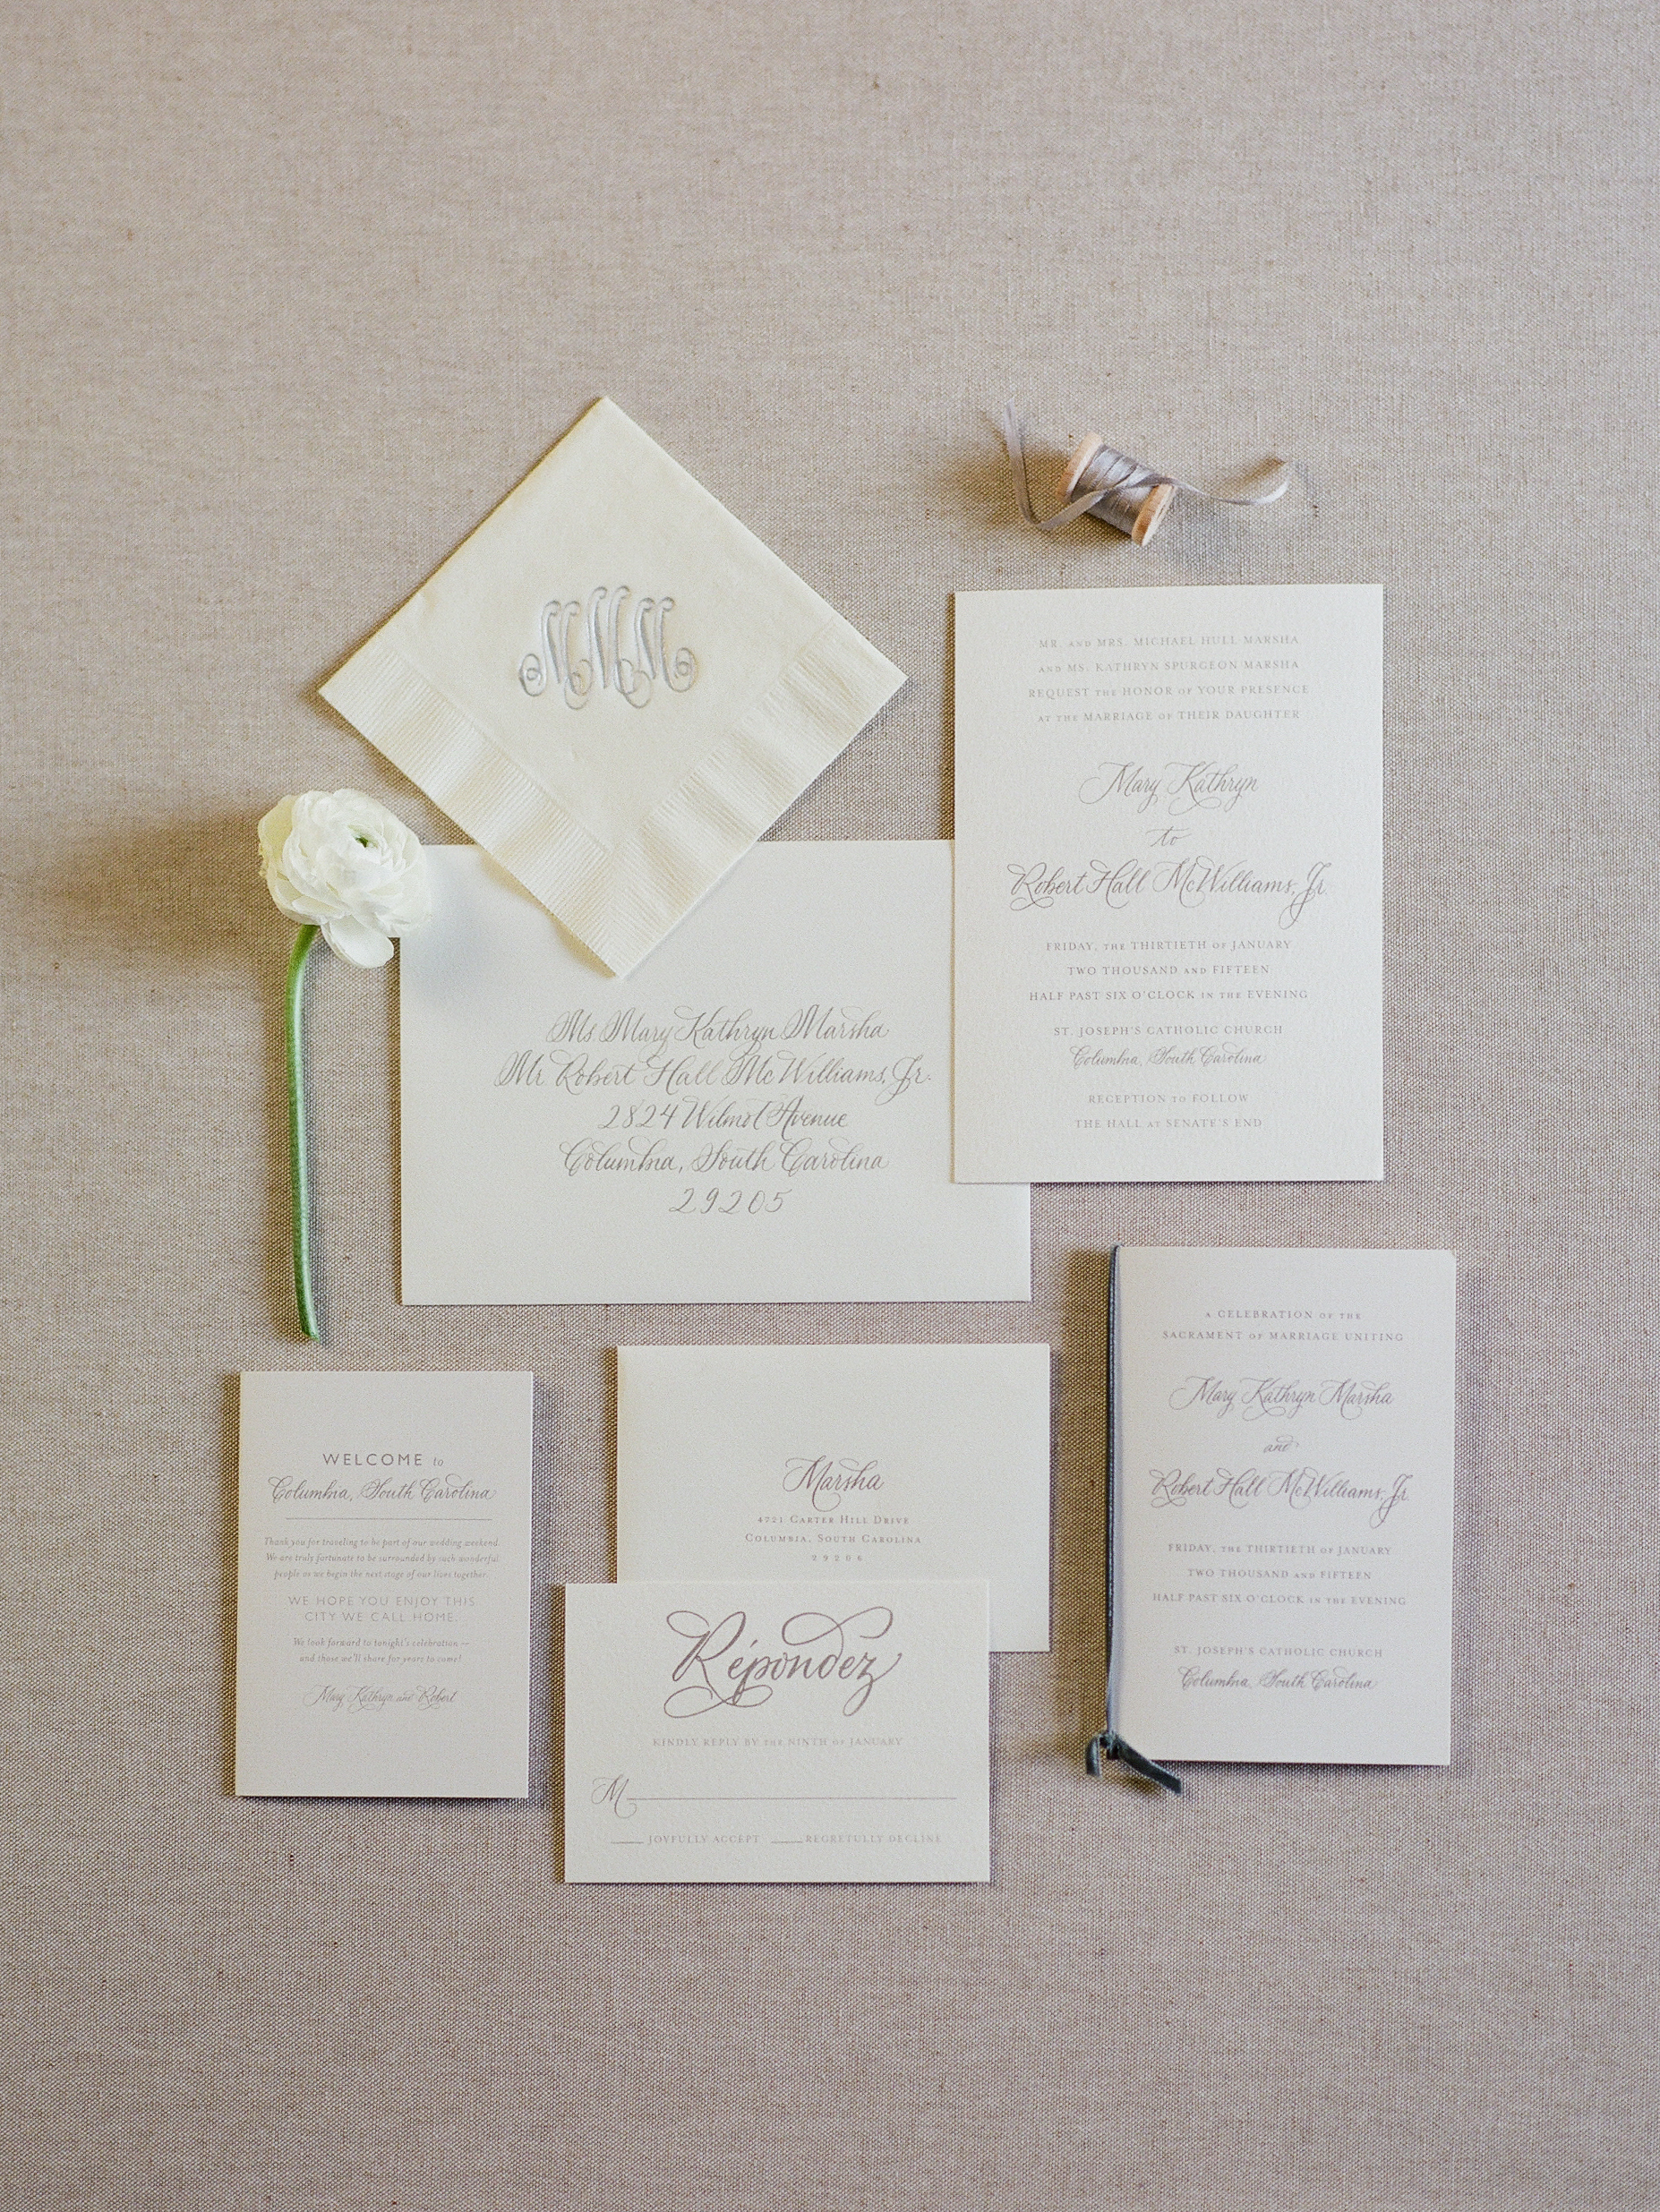 Silver and White Wedding Invitations - Elizabeth Anne Designs: The ...